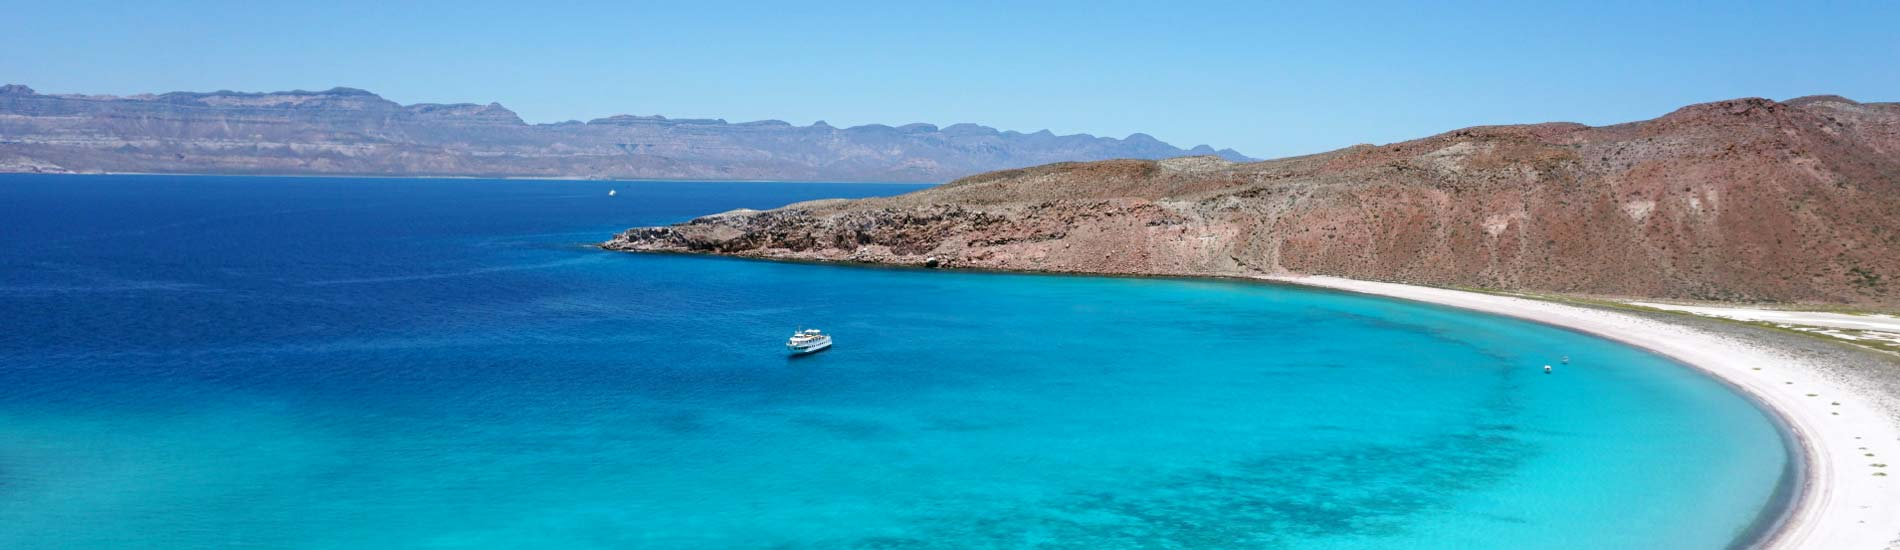 Baja California Luxury Vacation Experiences Journey Mexico